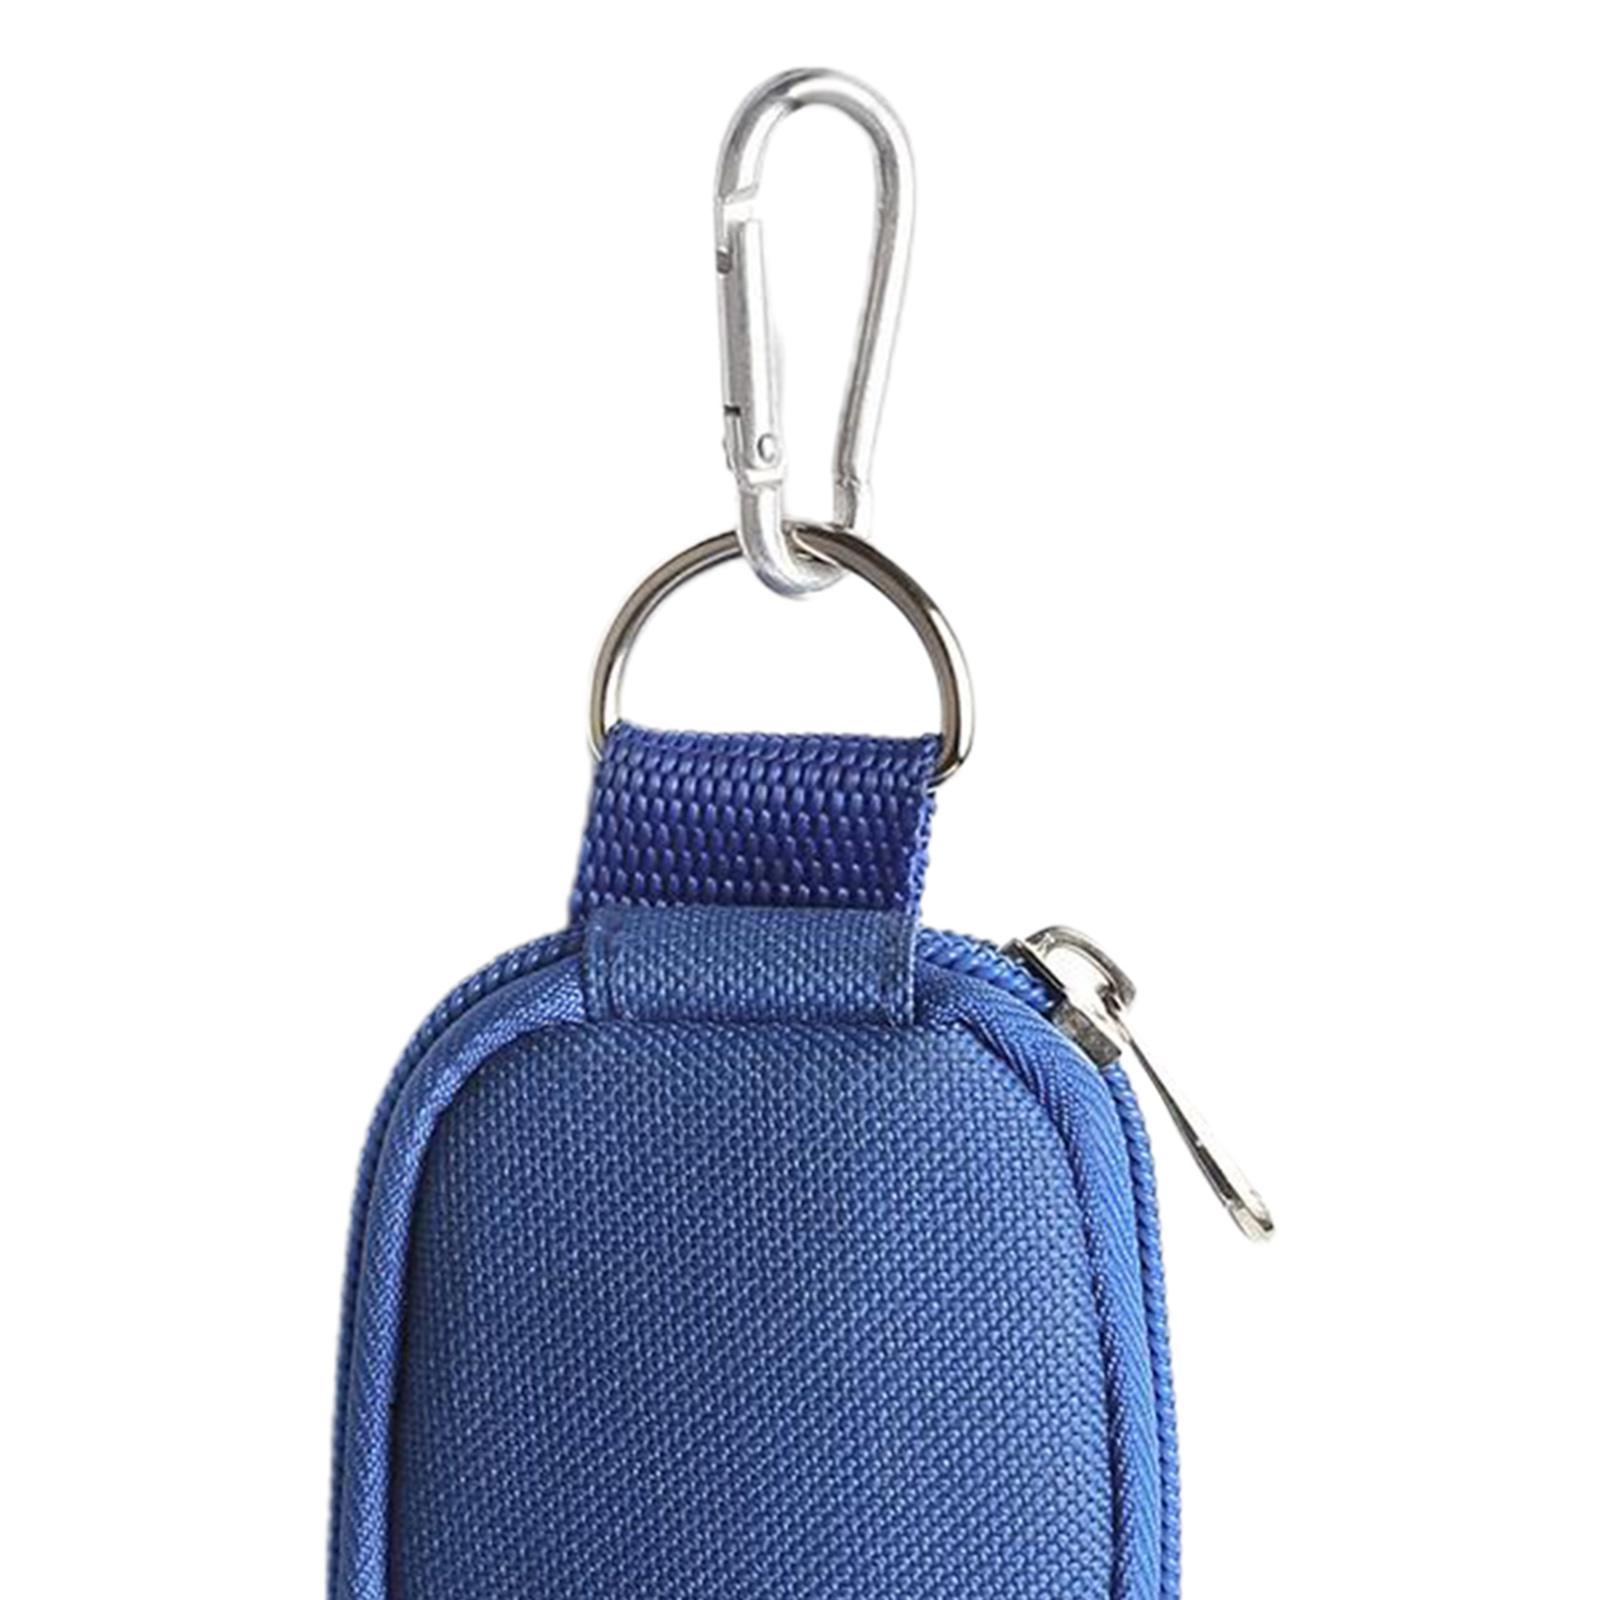 Custodia-protettiva-antiurto-per-custodia-antiurto-da-2-ml-10-bottiglie miniatura 9